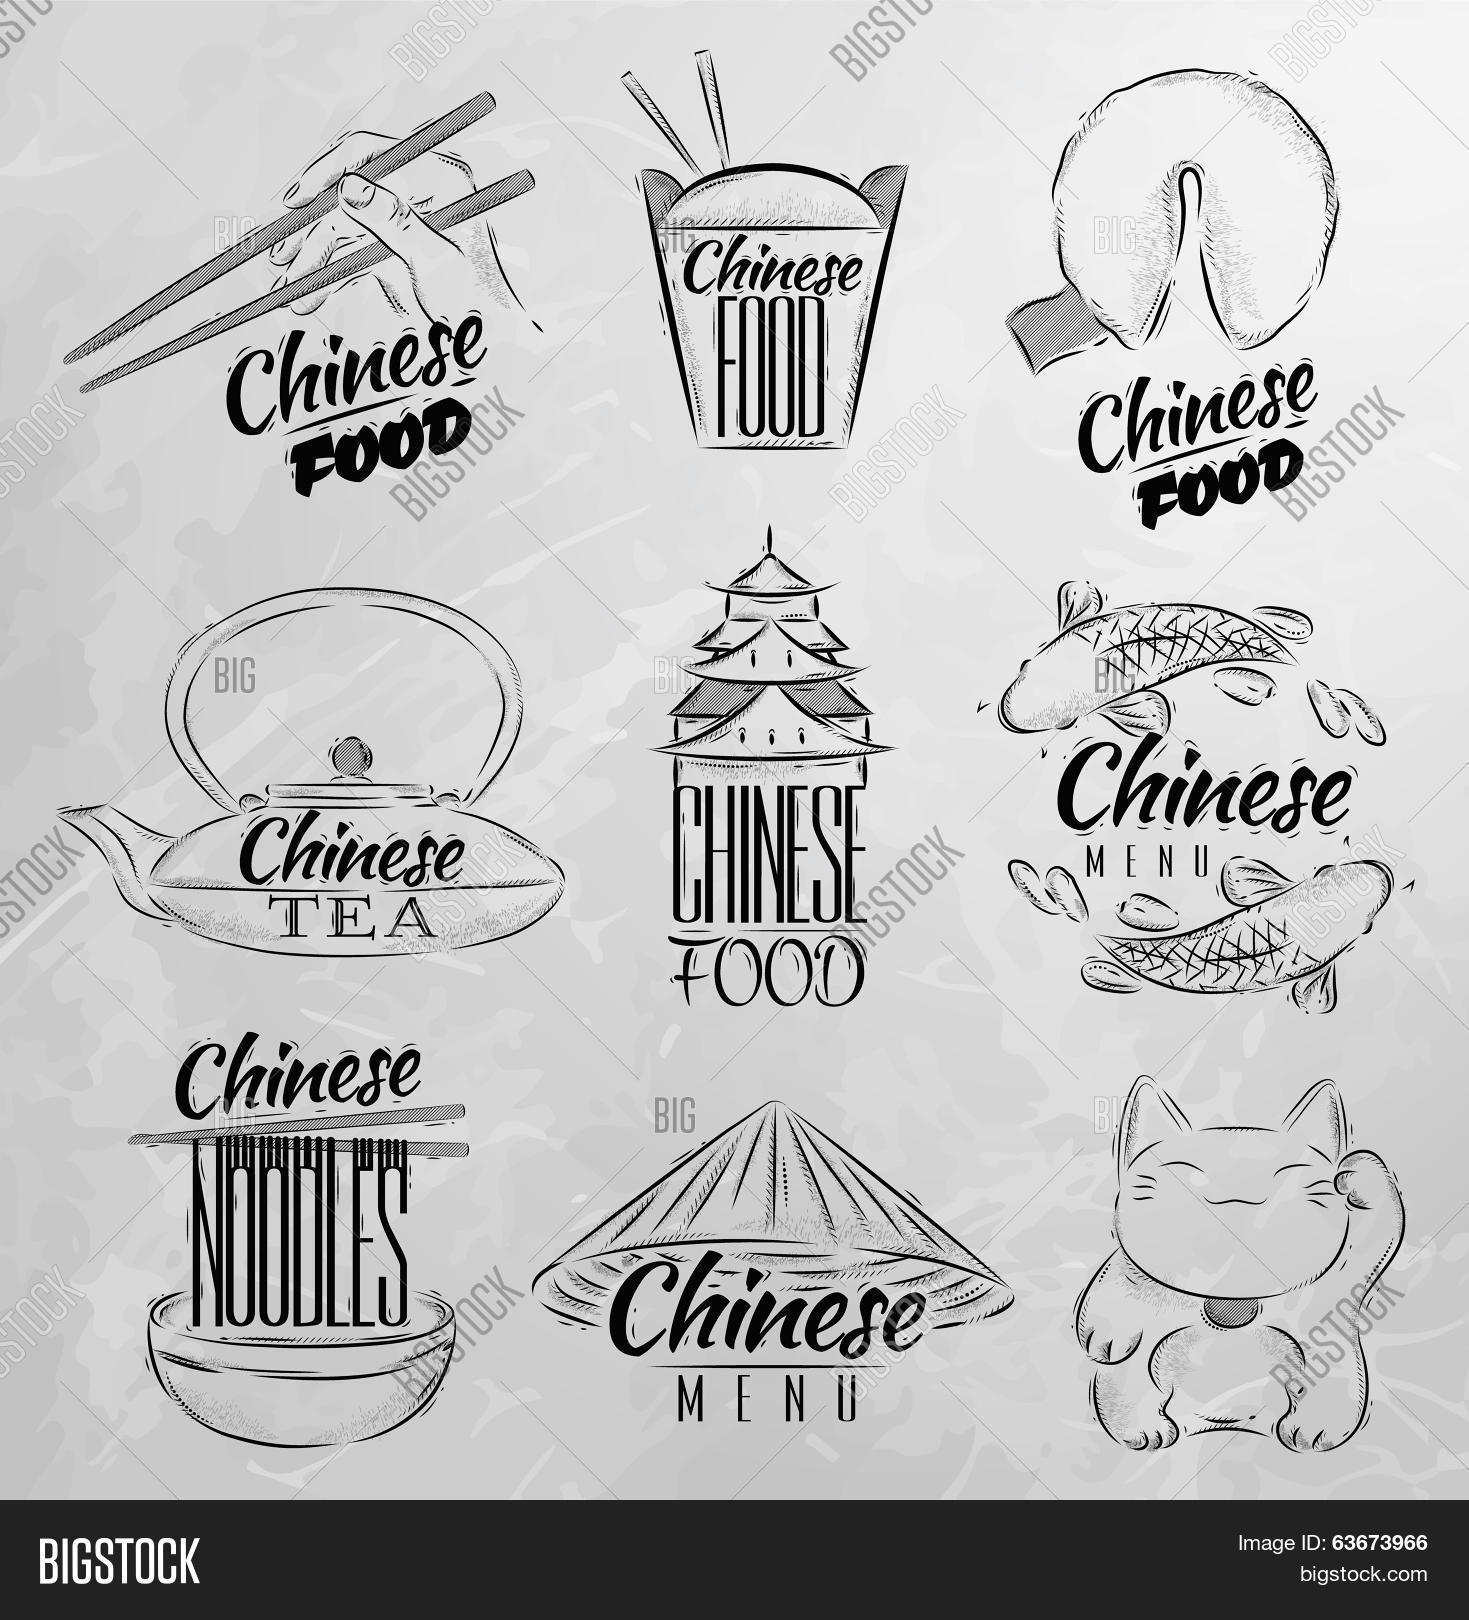 Chinese Food Symbols Vector Photo Free Trial Bigstock